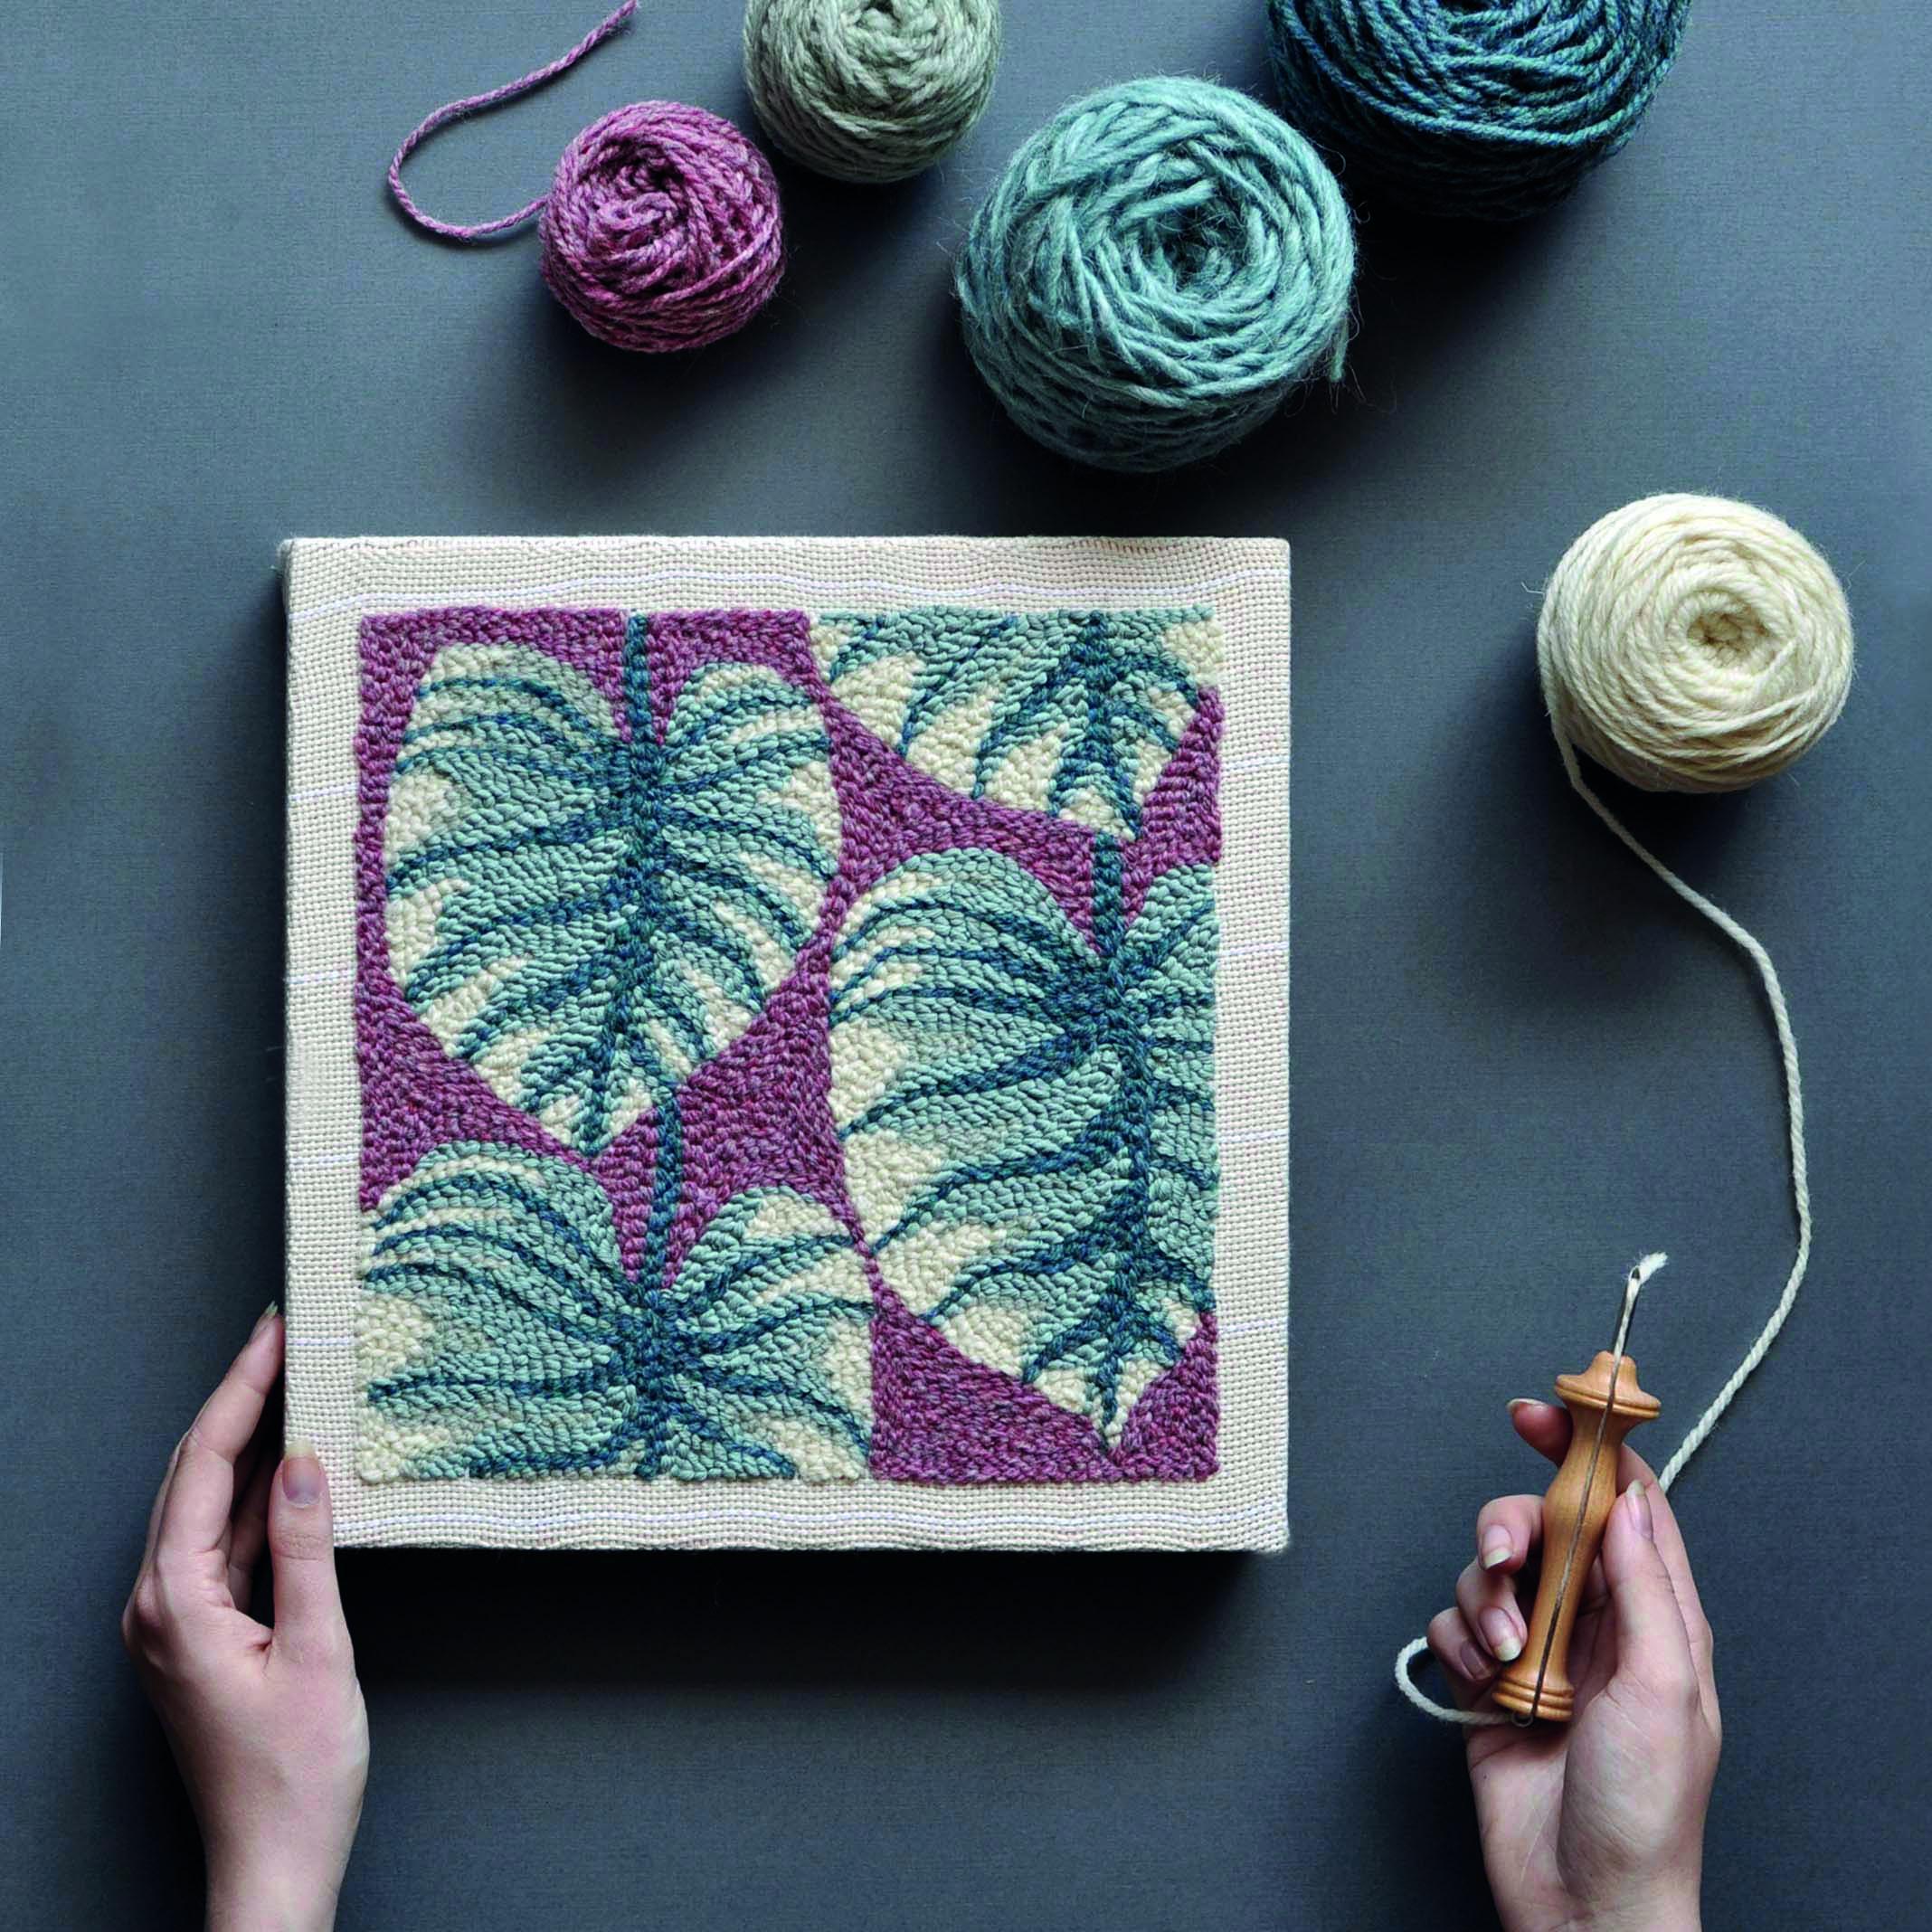 leaves pattern punch needle - arounna k.jpg